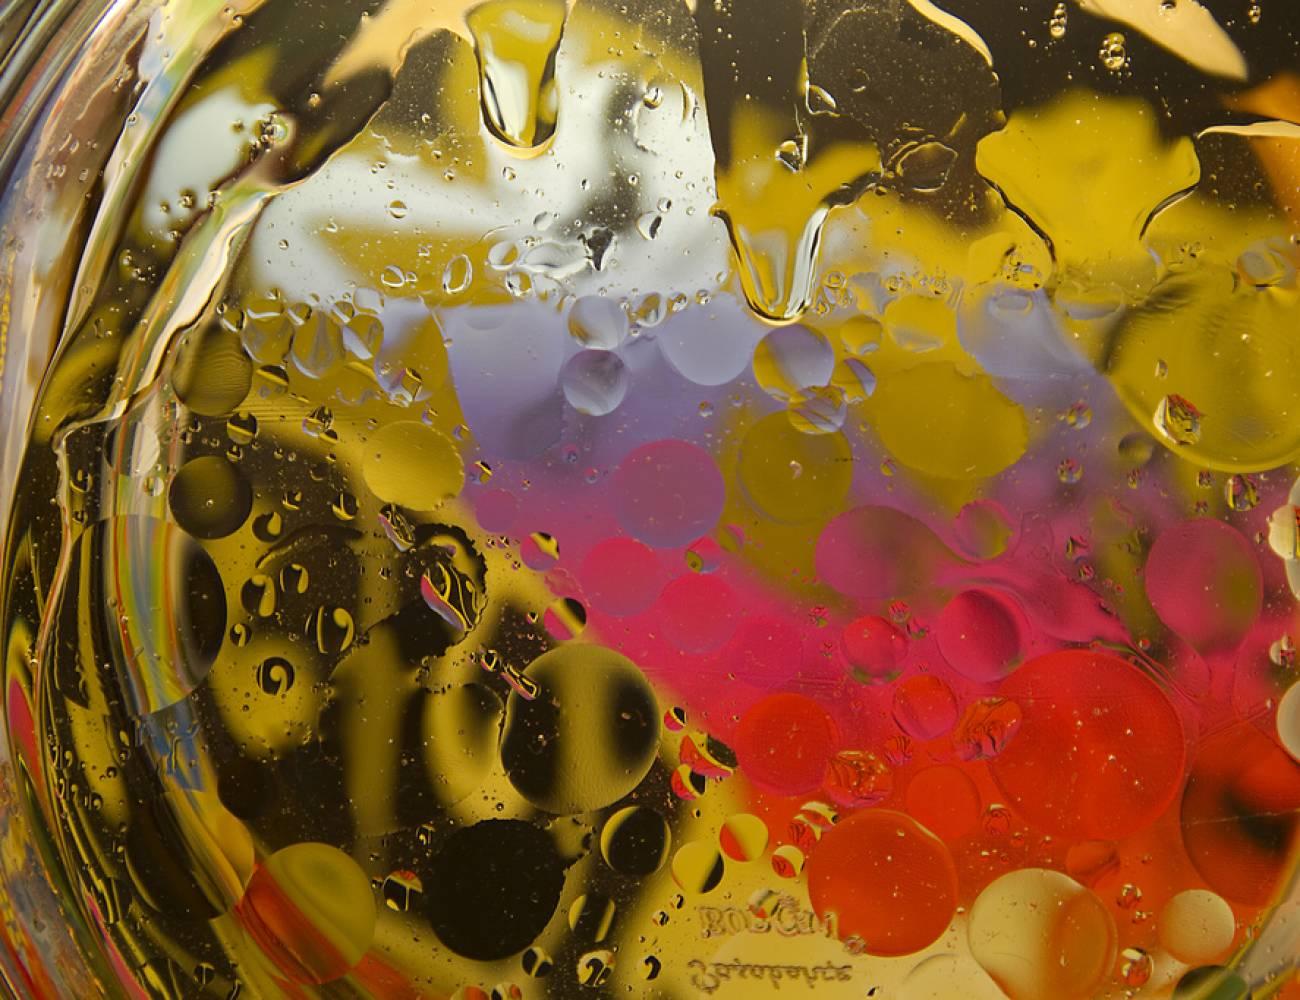 abstract-q-c-1300-1000-8